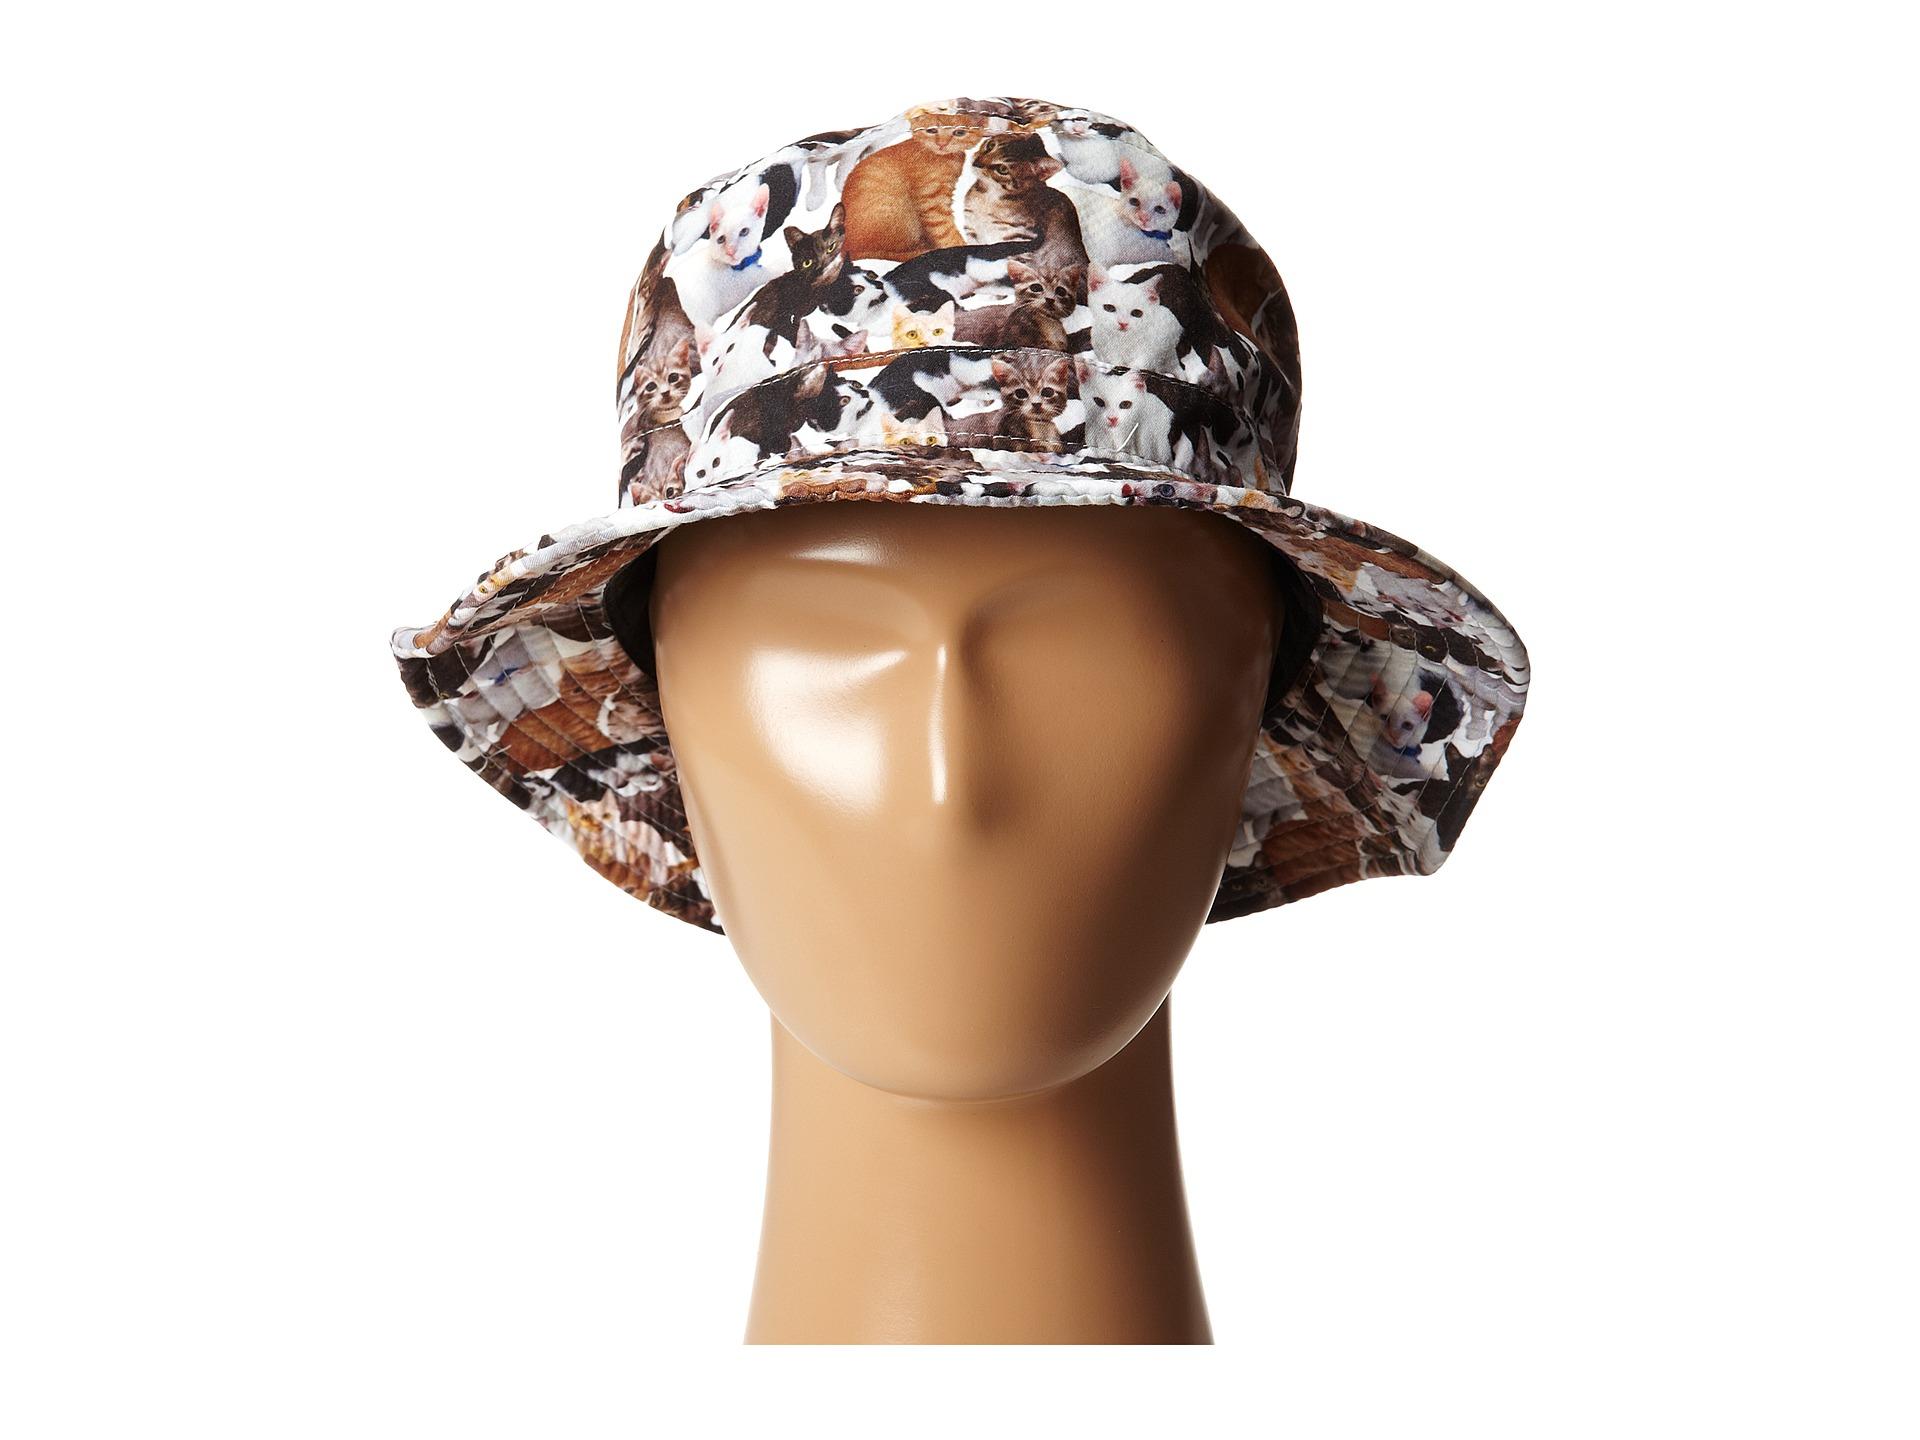 Lyst - Vans ® X Aspca® Bucket Hat 6159e1639b3